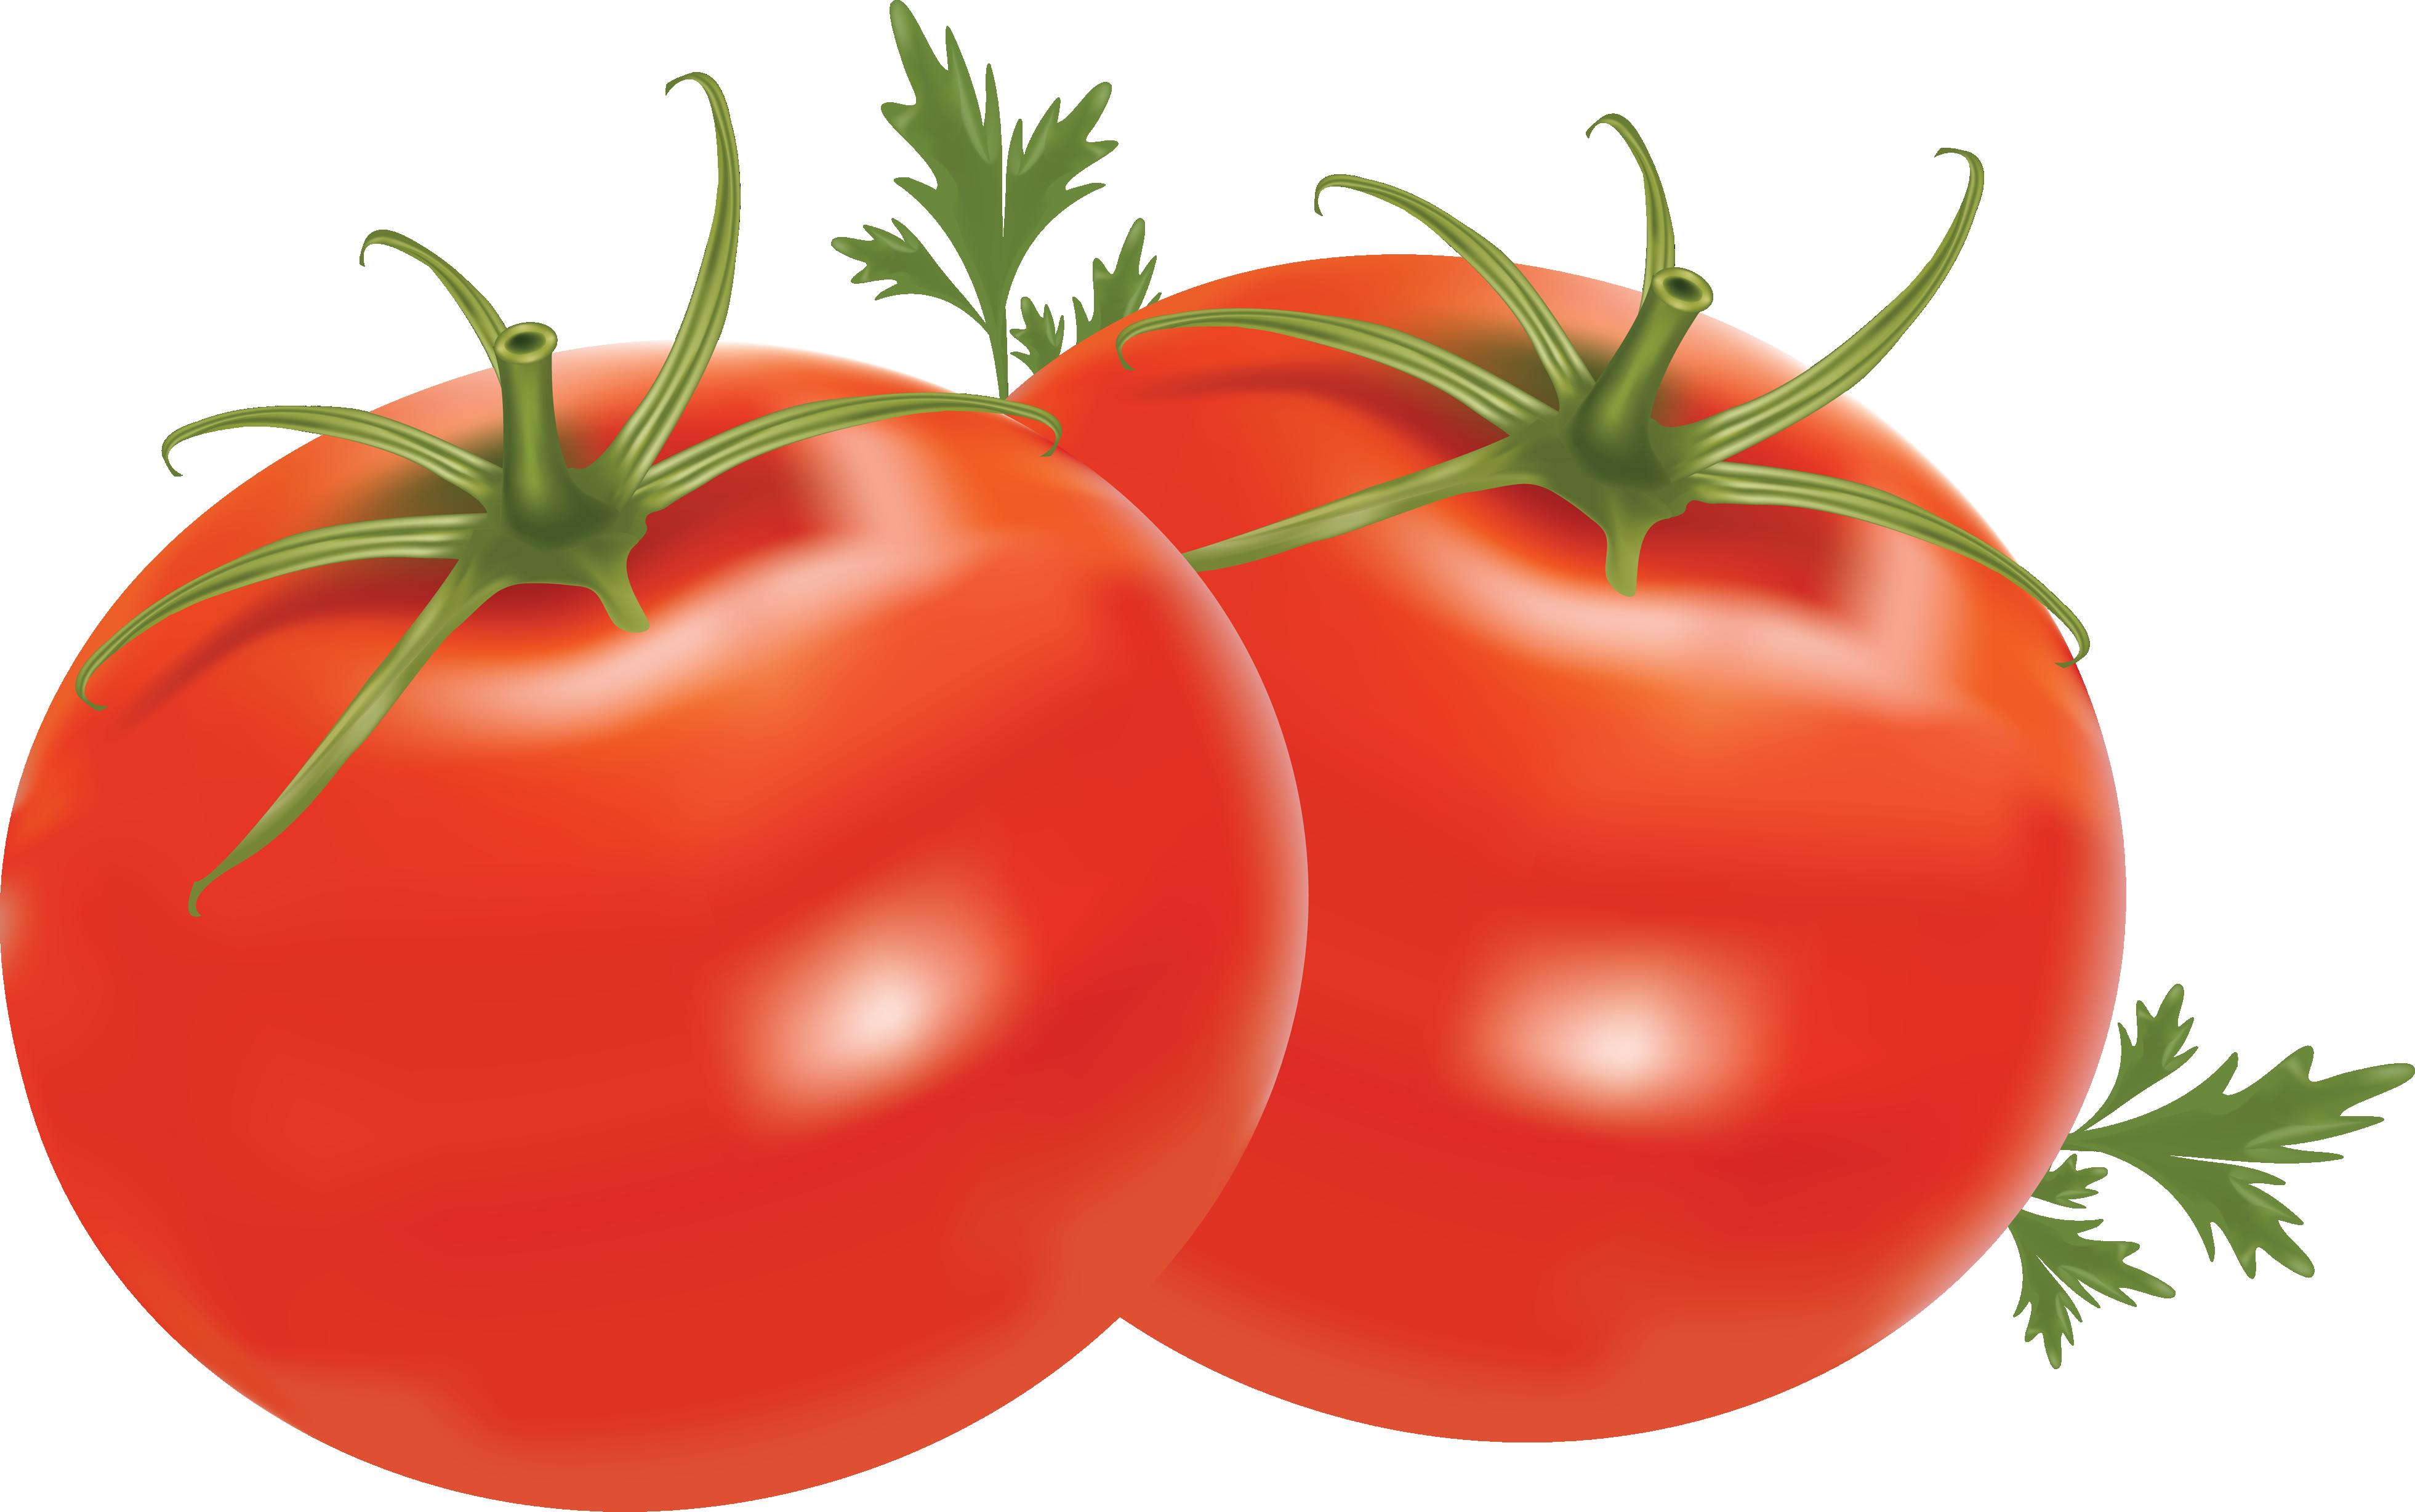 Vegetable clipart tomatoe #17615 Picture Tomato Tomato Clipart